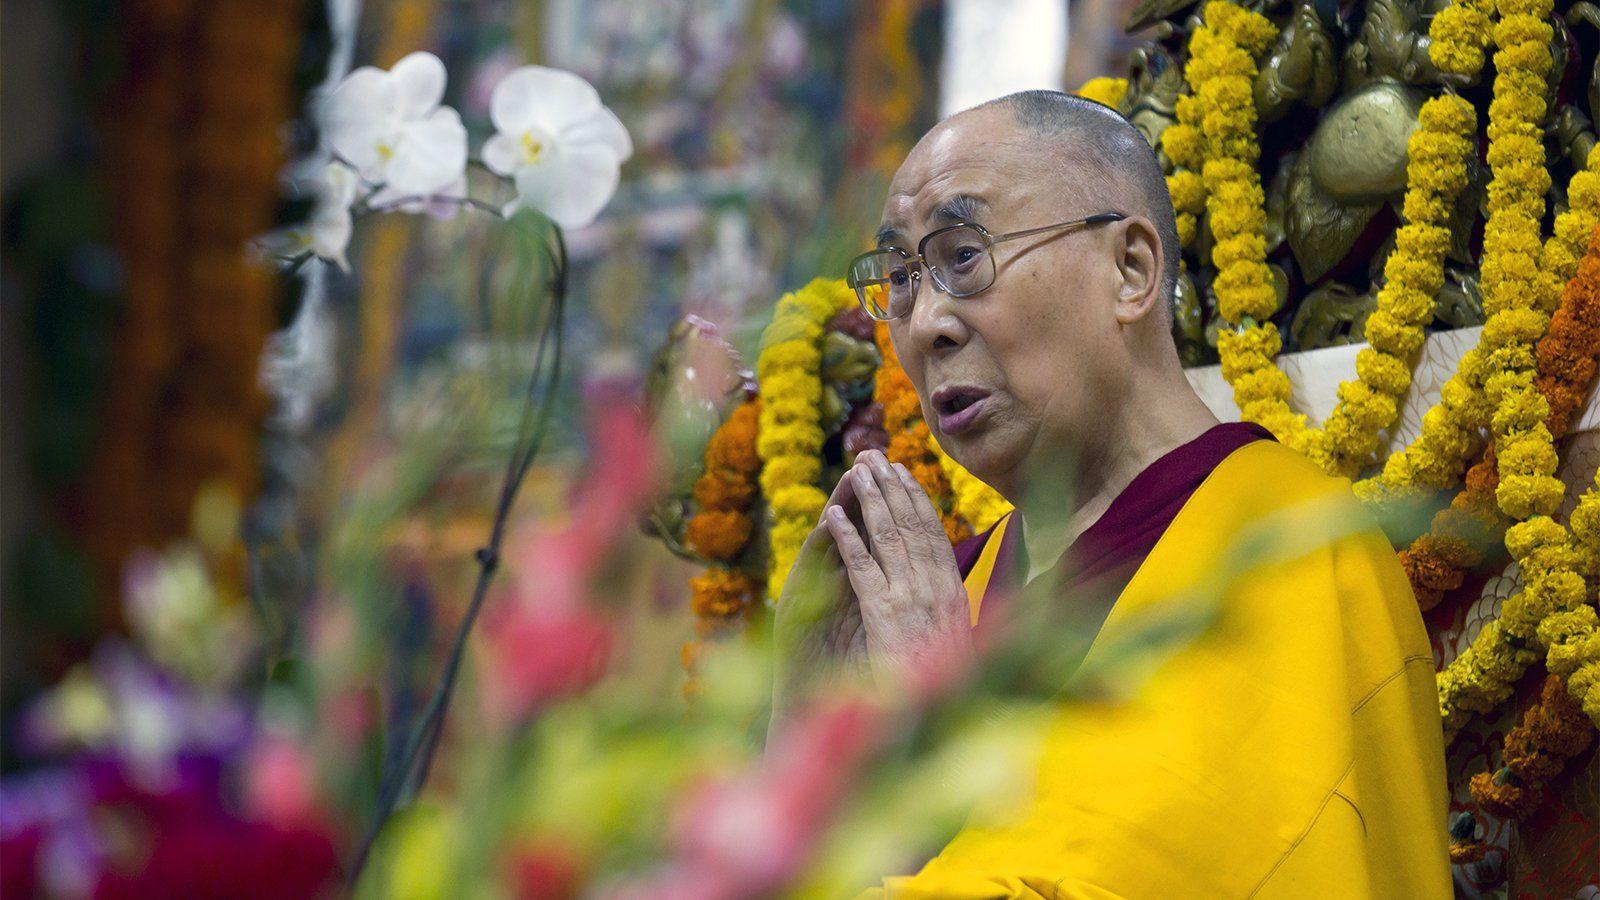 Buddhist monks to consider whether Dalai Lama should